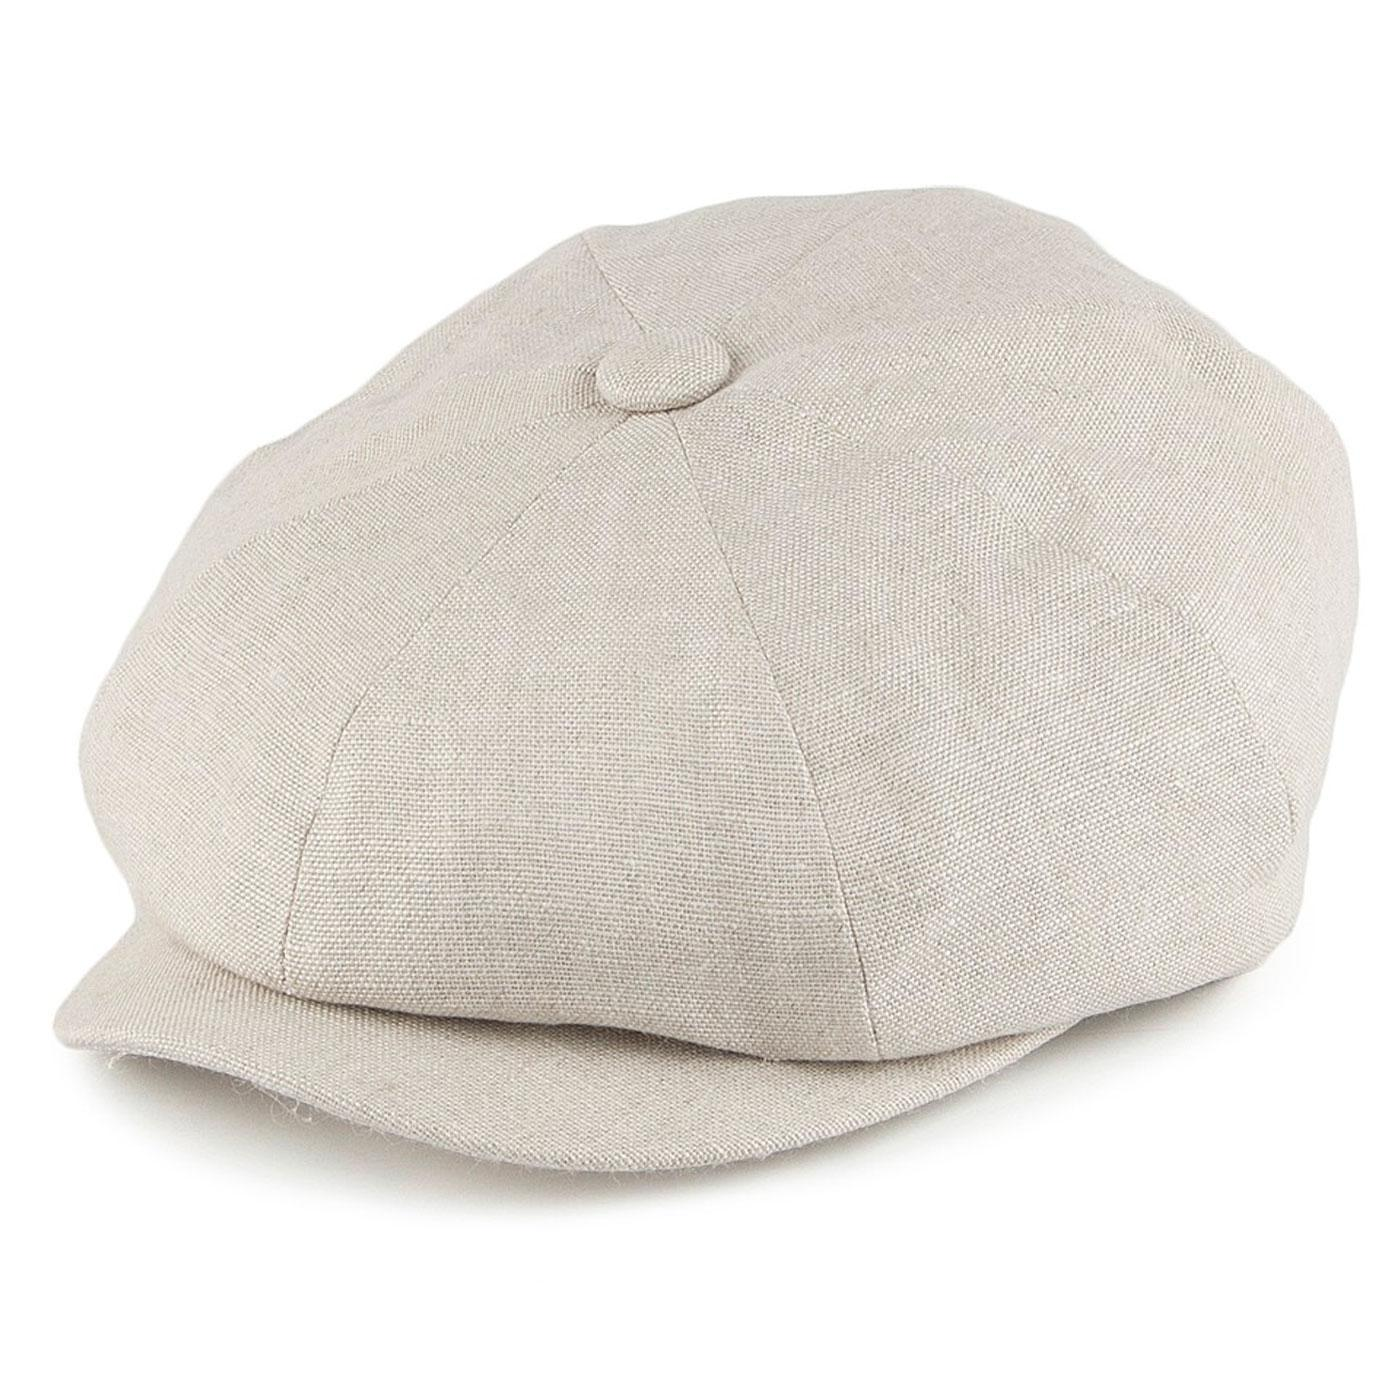 FAILSWORTH Retro Irish Linen Gatsby Hat (Natural)